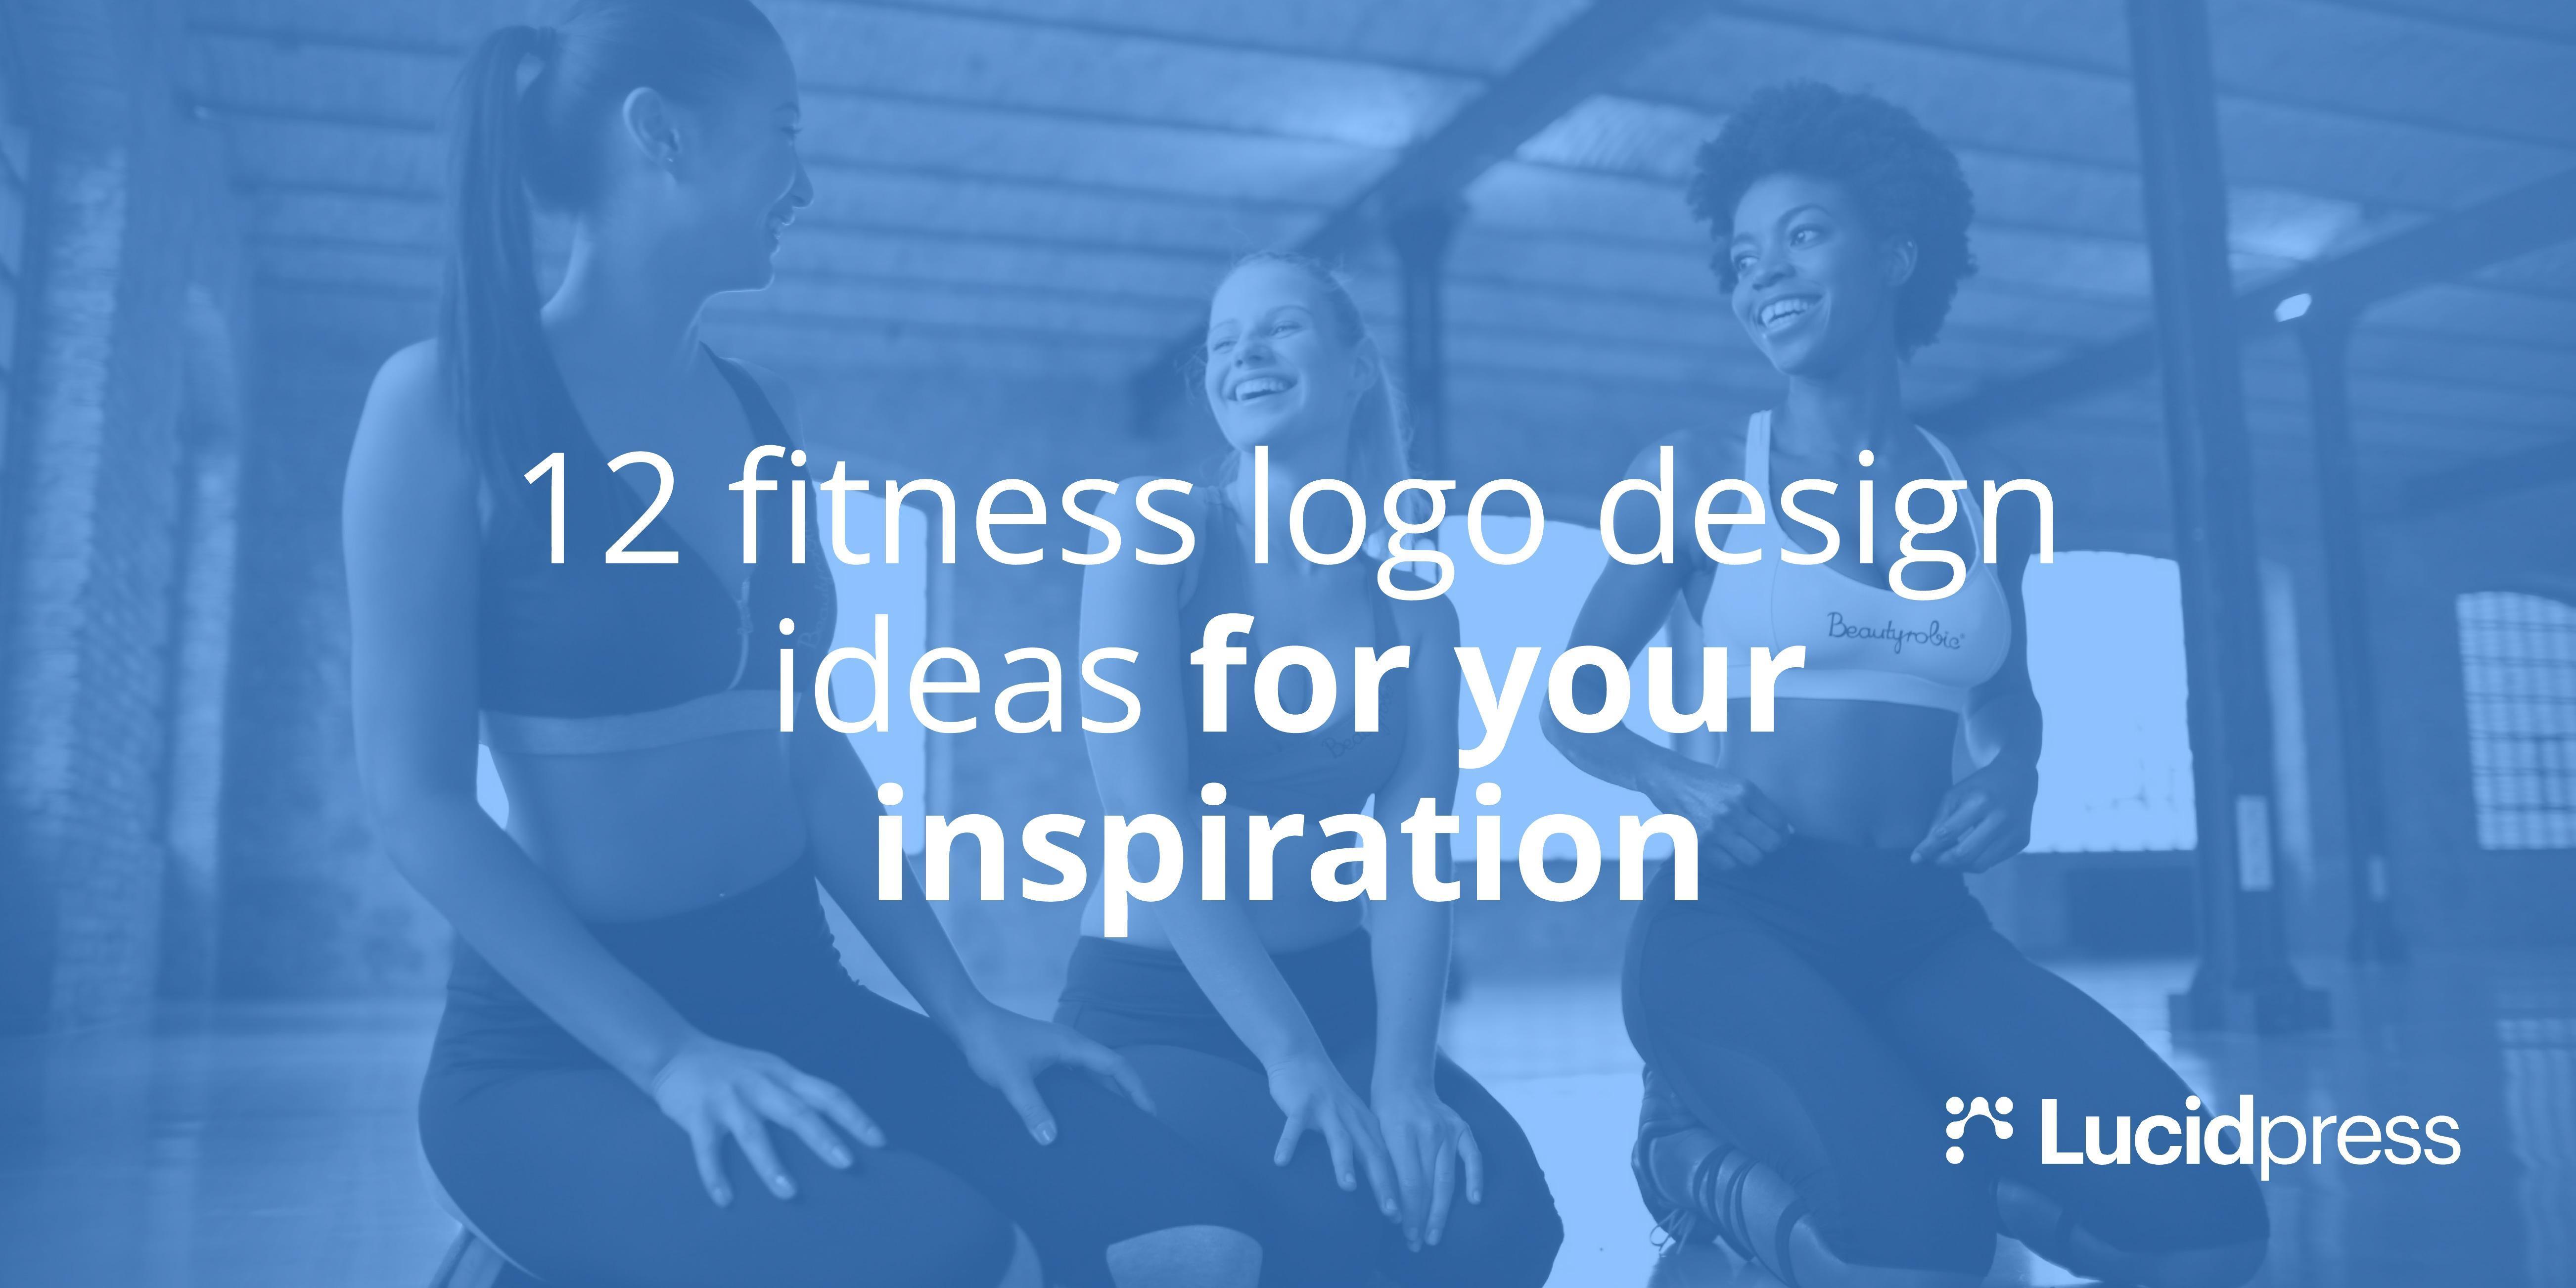 12 Fitness Logo Design Ideas for Your Inspiration   Lucidpress